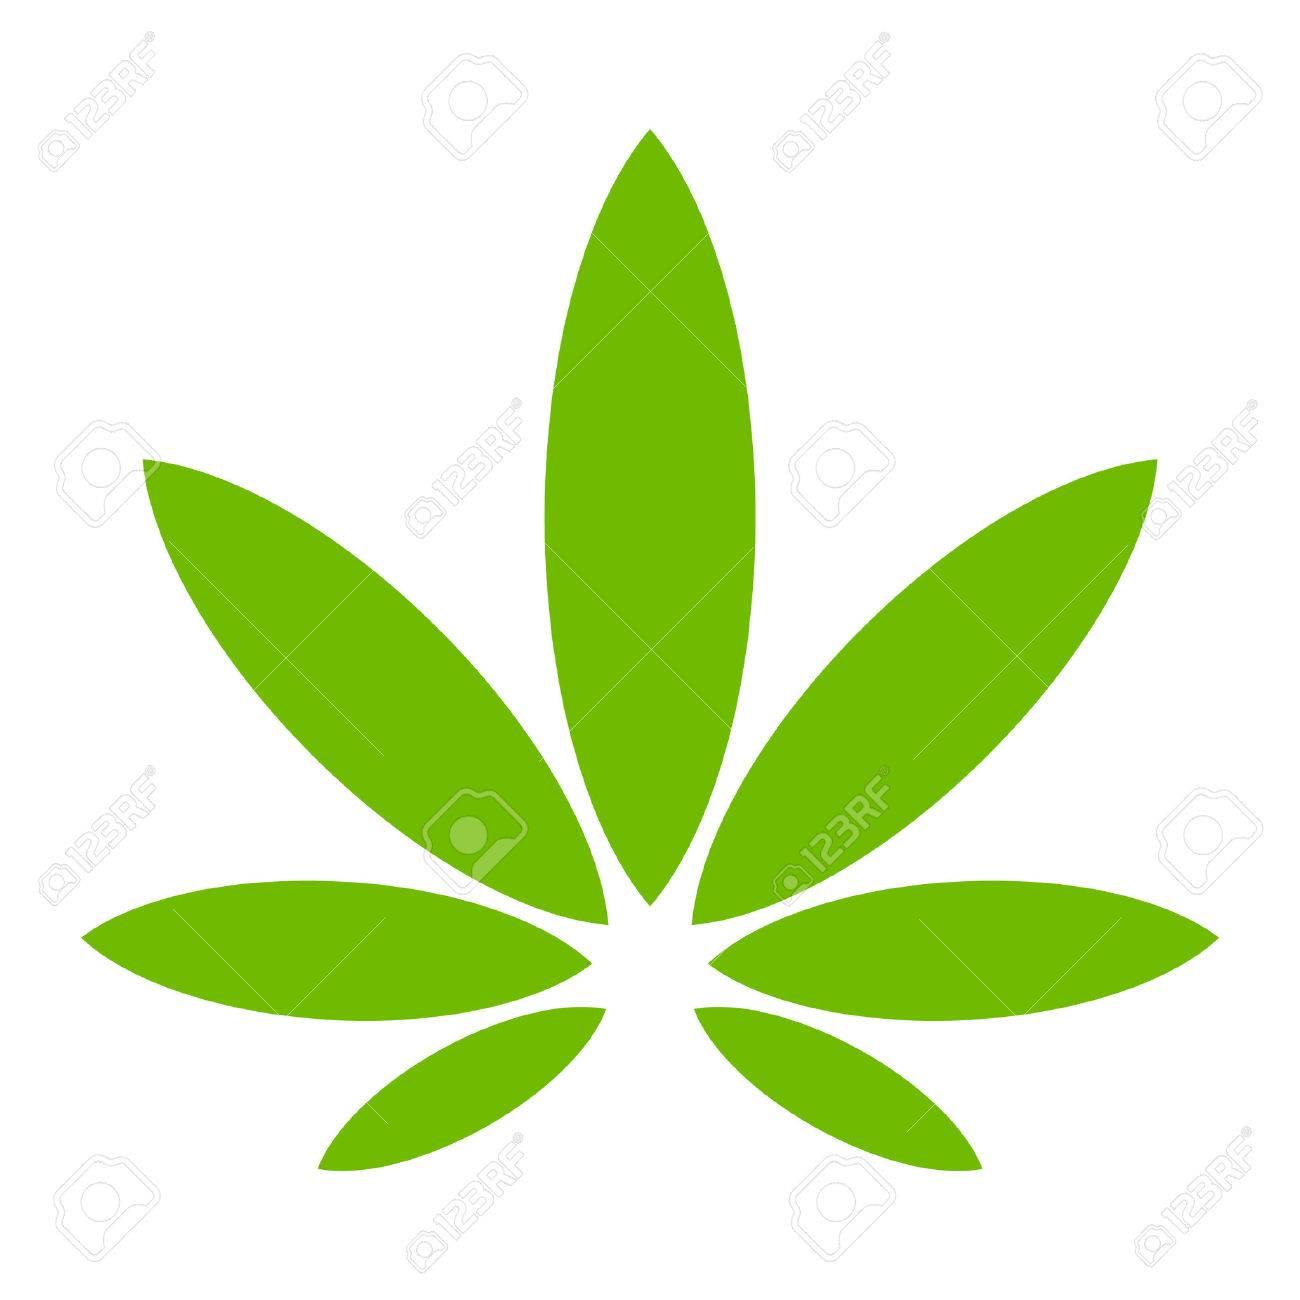 Marijuana pot weed leaf symbol royalty free cliparts vectors and marijuana pot weed leaf symbol stock vector 49650663 biocorpaavc